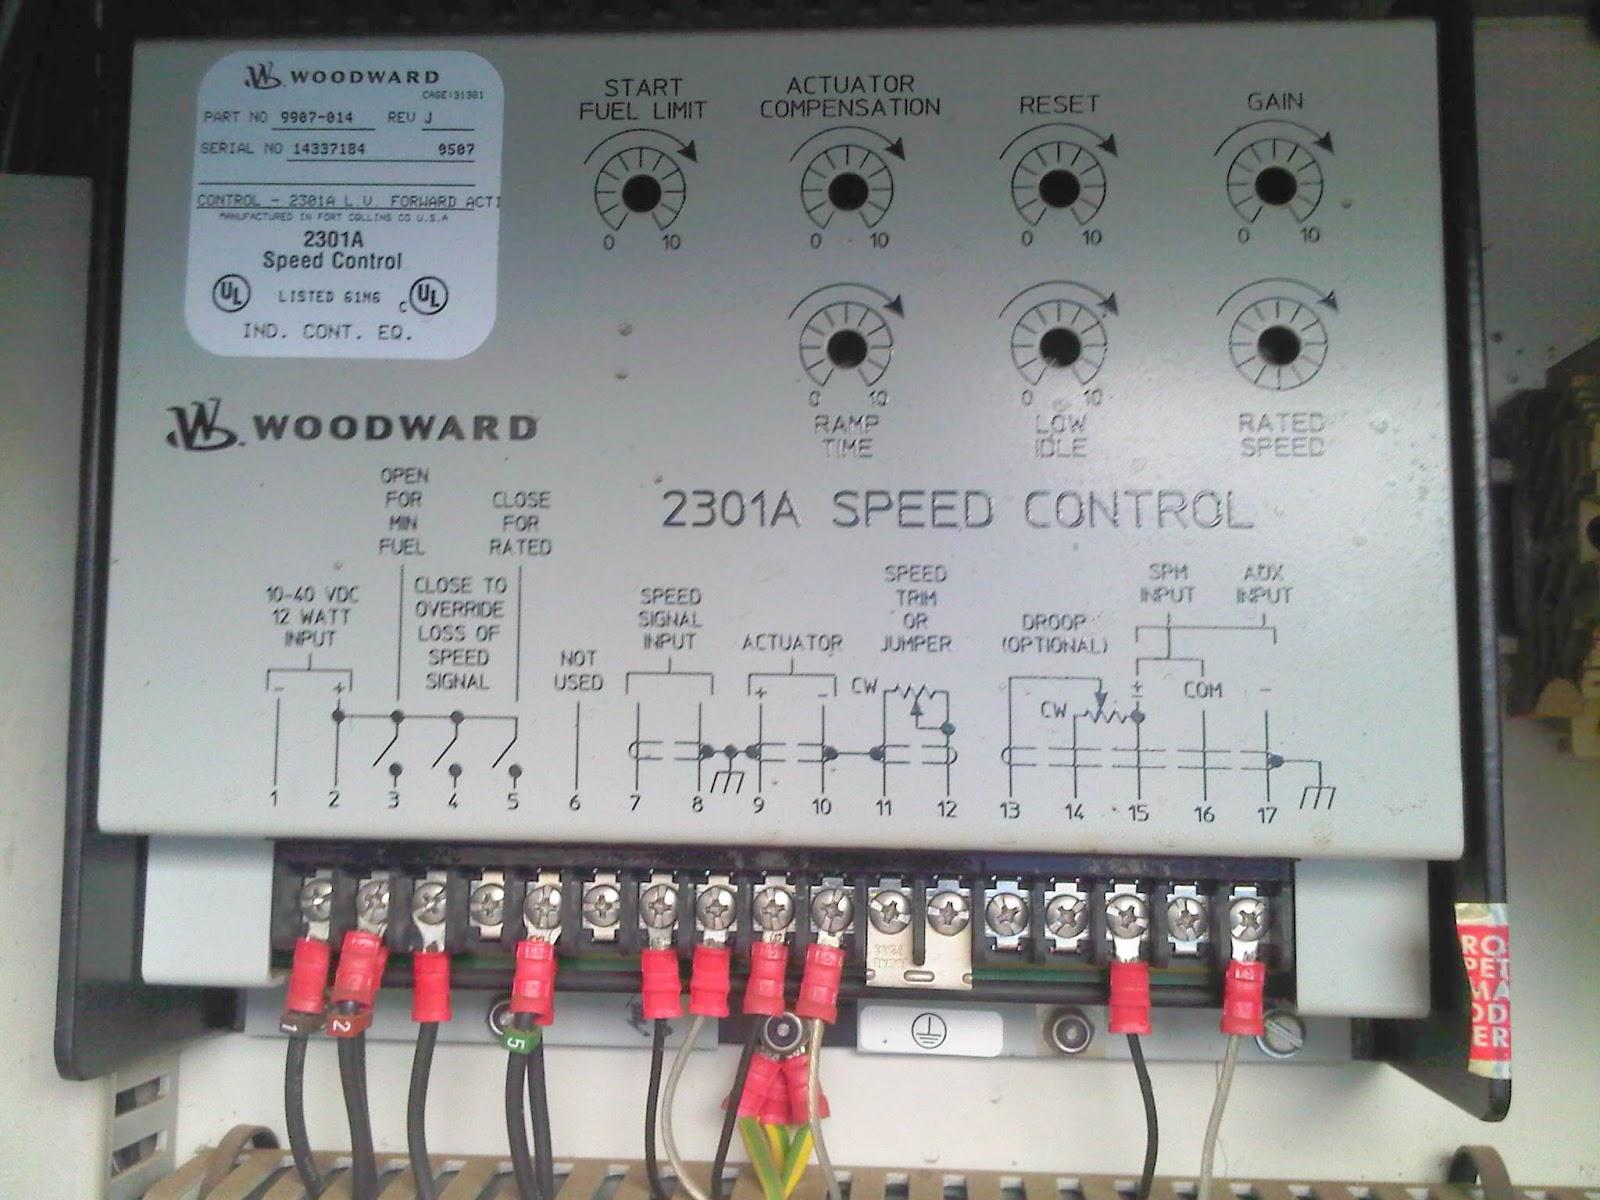 woodward speed control egcp 3 exporter stockist of marine engine rh atlasshipcare blogspot com Woodward 2301 Manual Woodward Governors Manuals